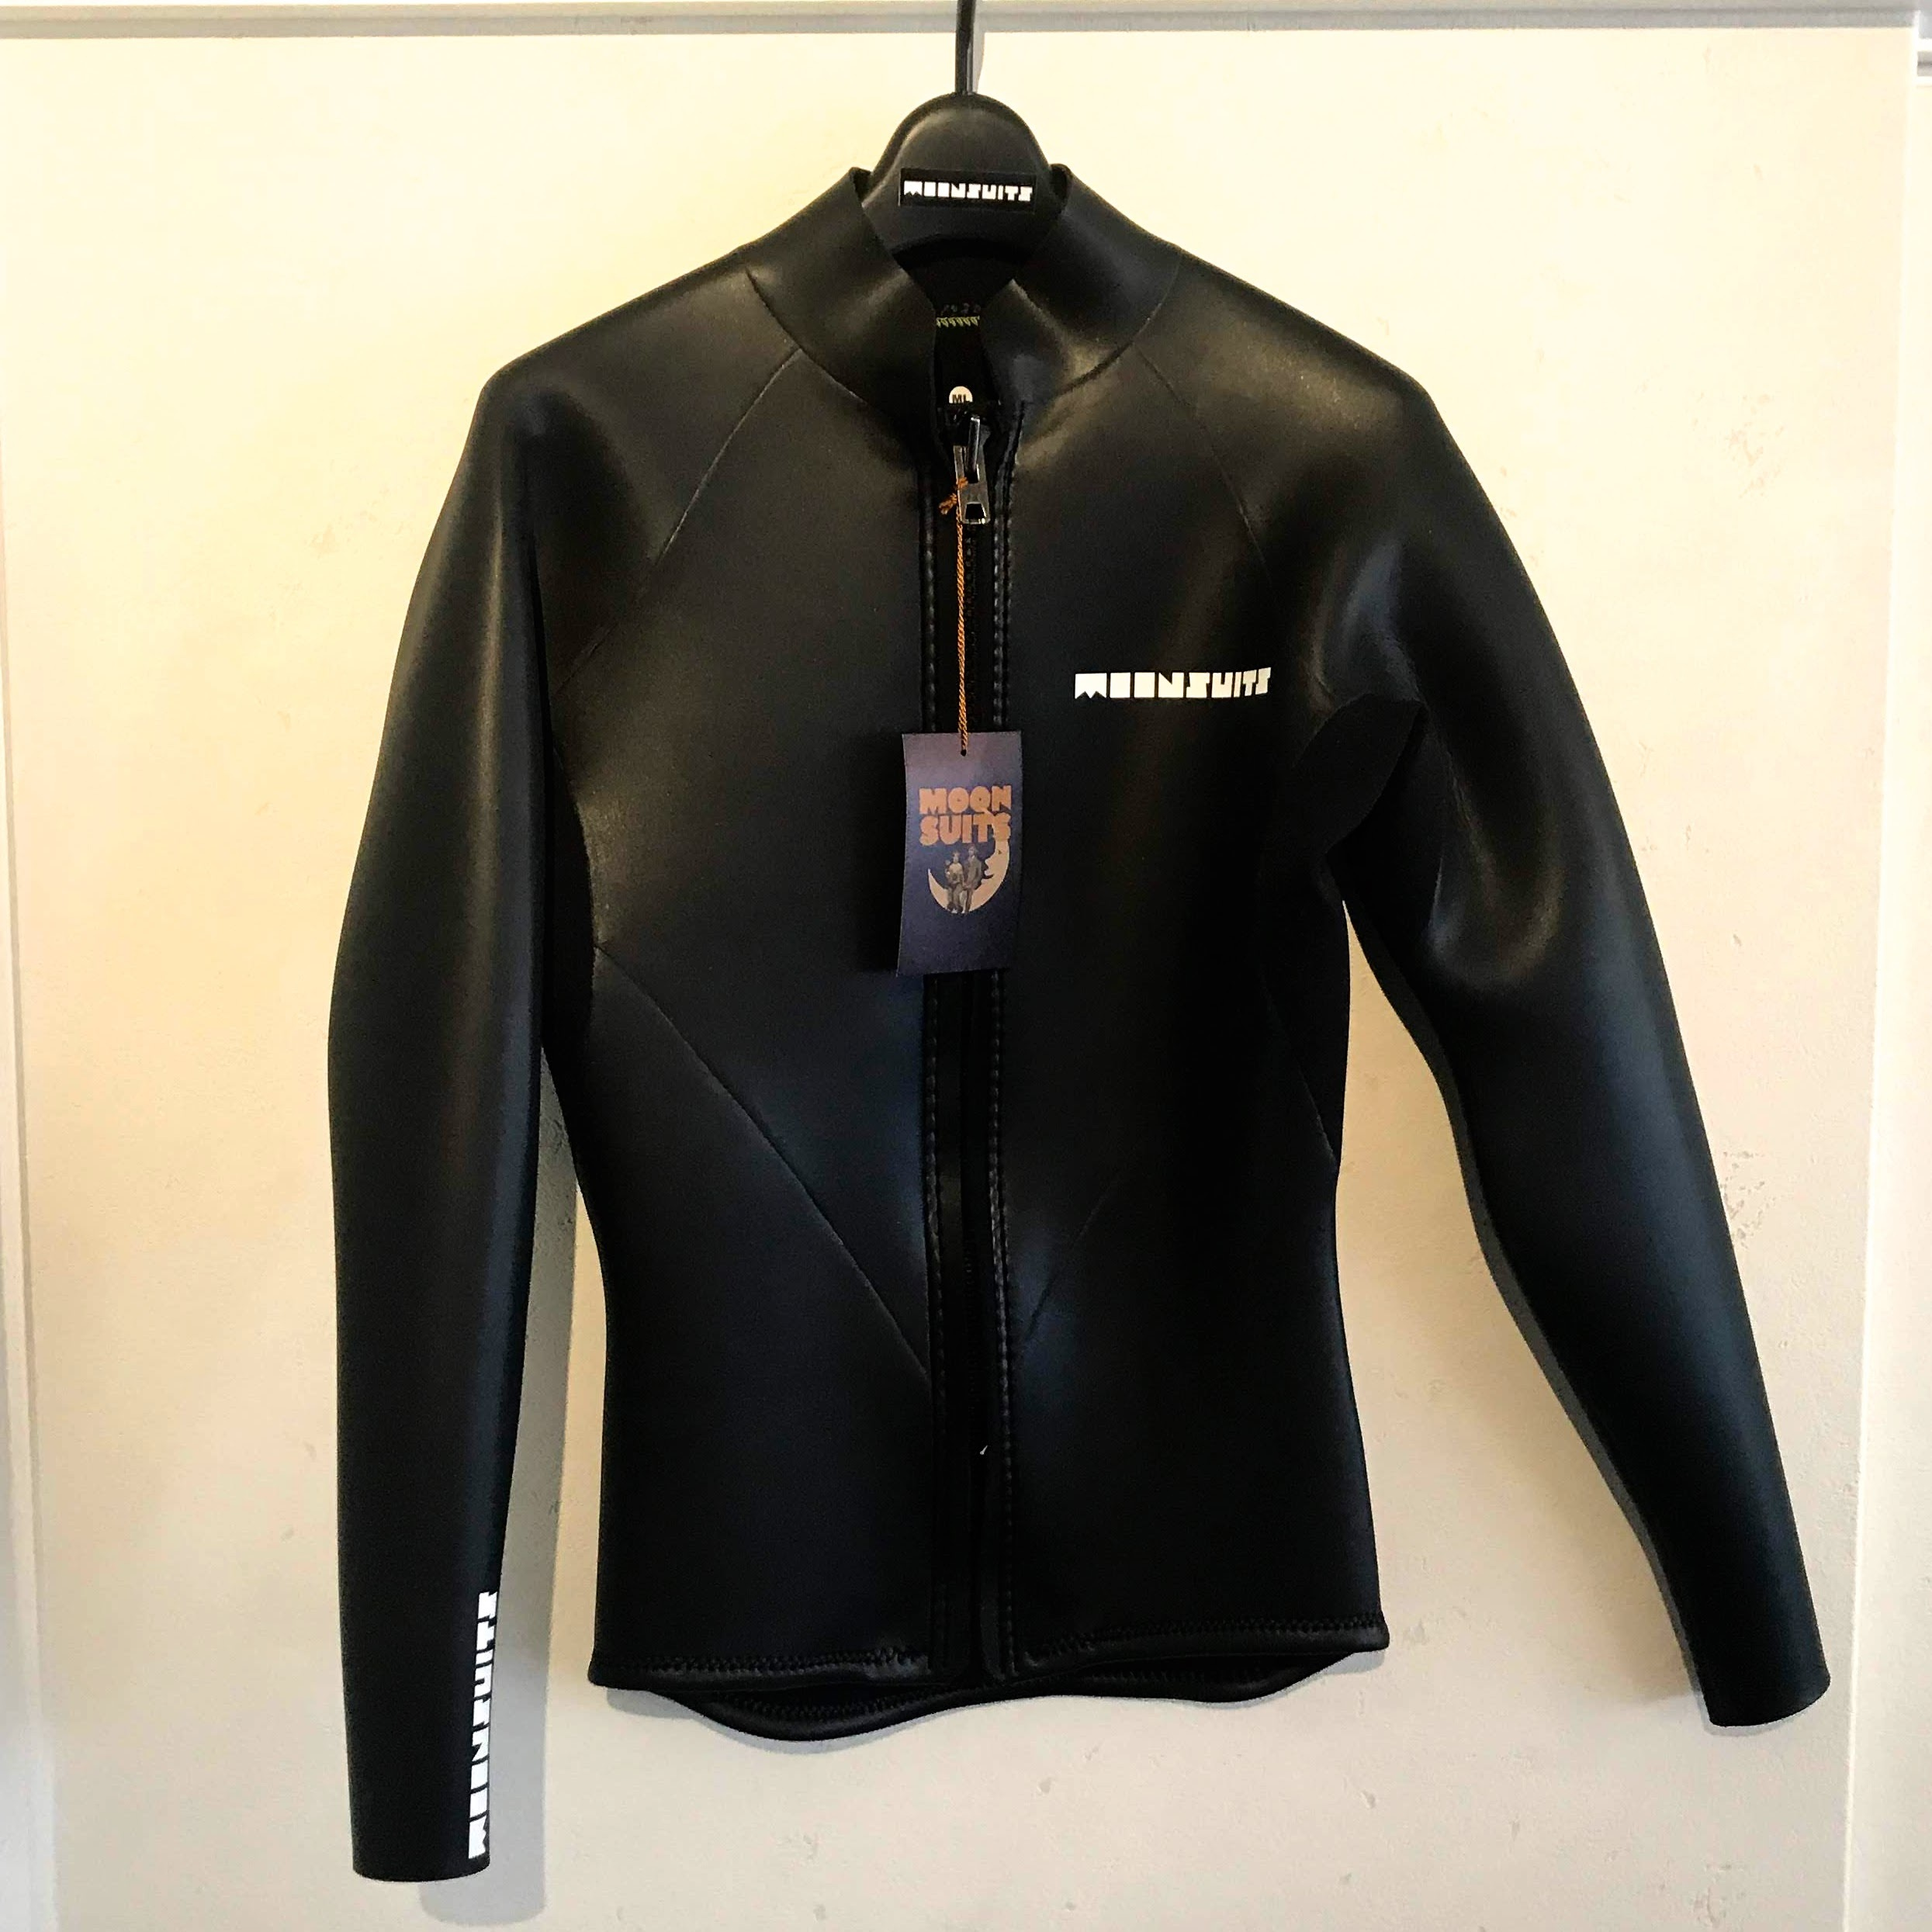 【MOON WETSUITS】ムーンウエットスーツ 2mm 長袖フロントジップジャケット standard